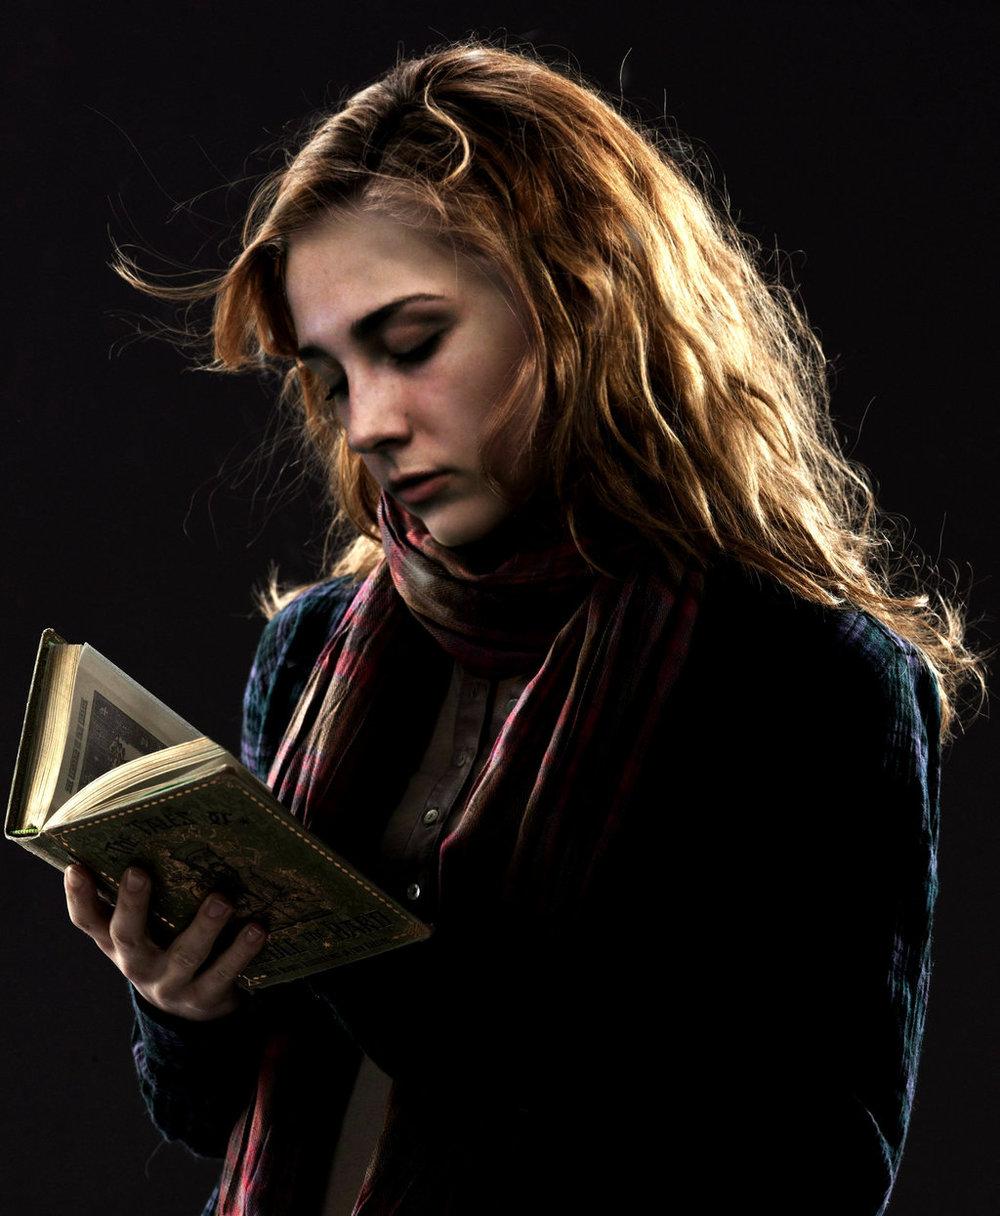 hermione_granger_ii_by_a_scudder-d68h0o1.jpg